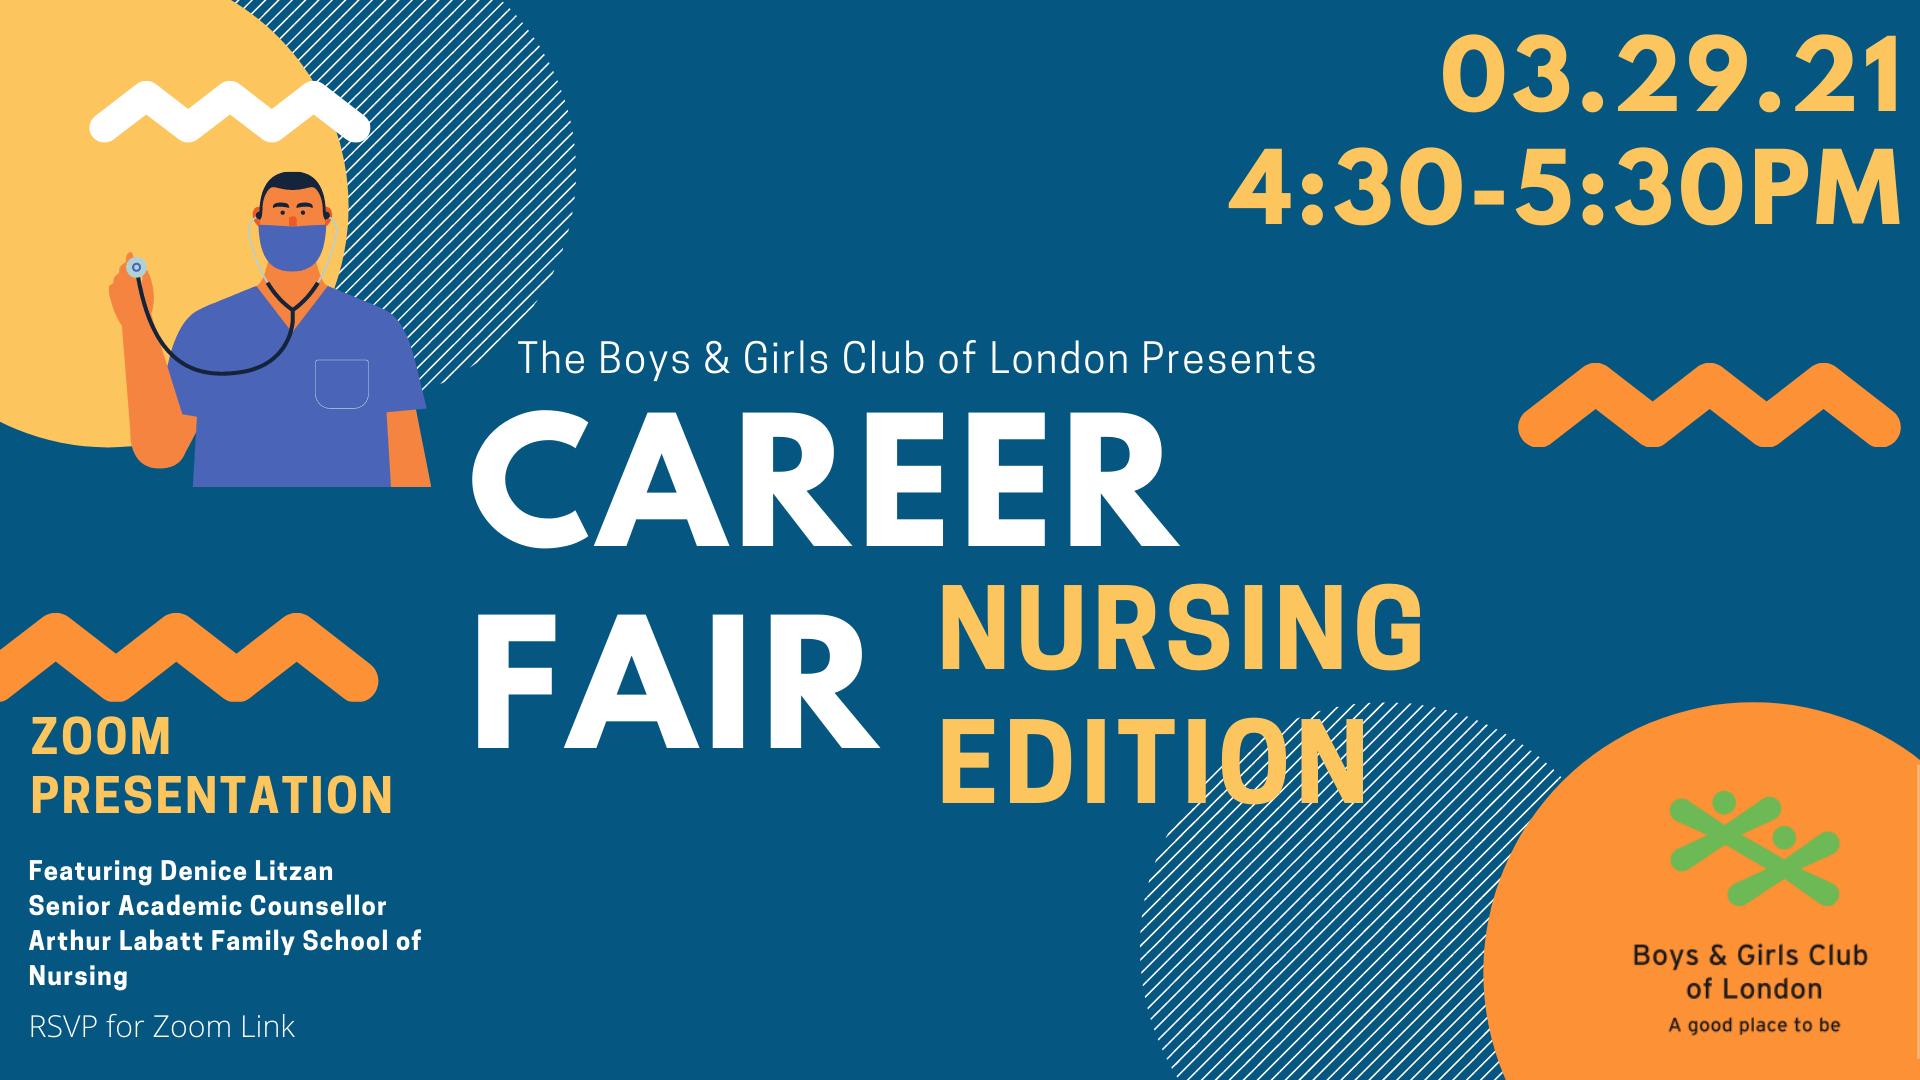 Career Fair Nursing Edition